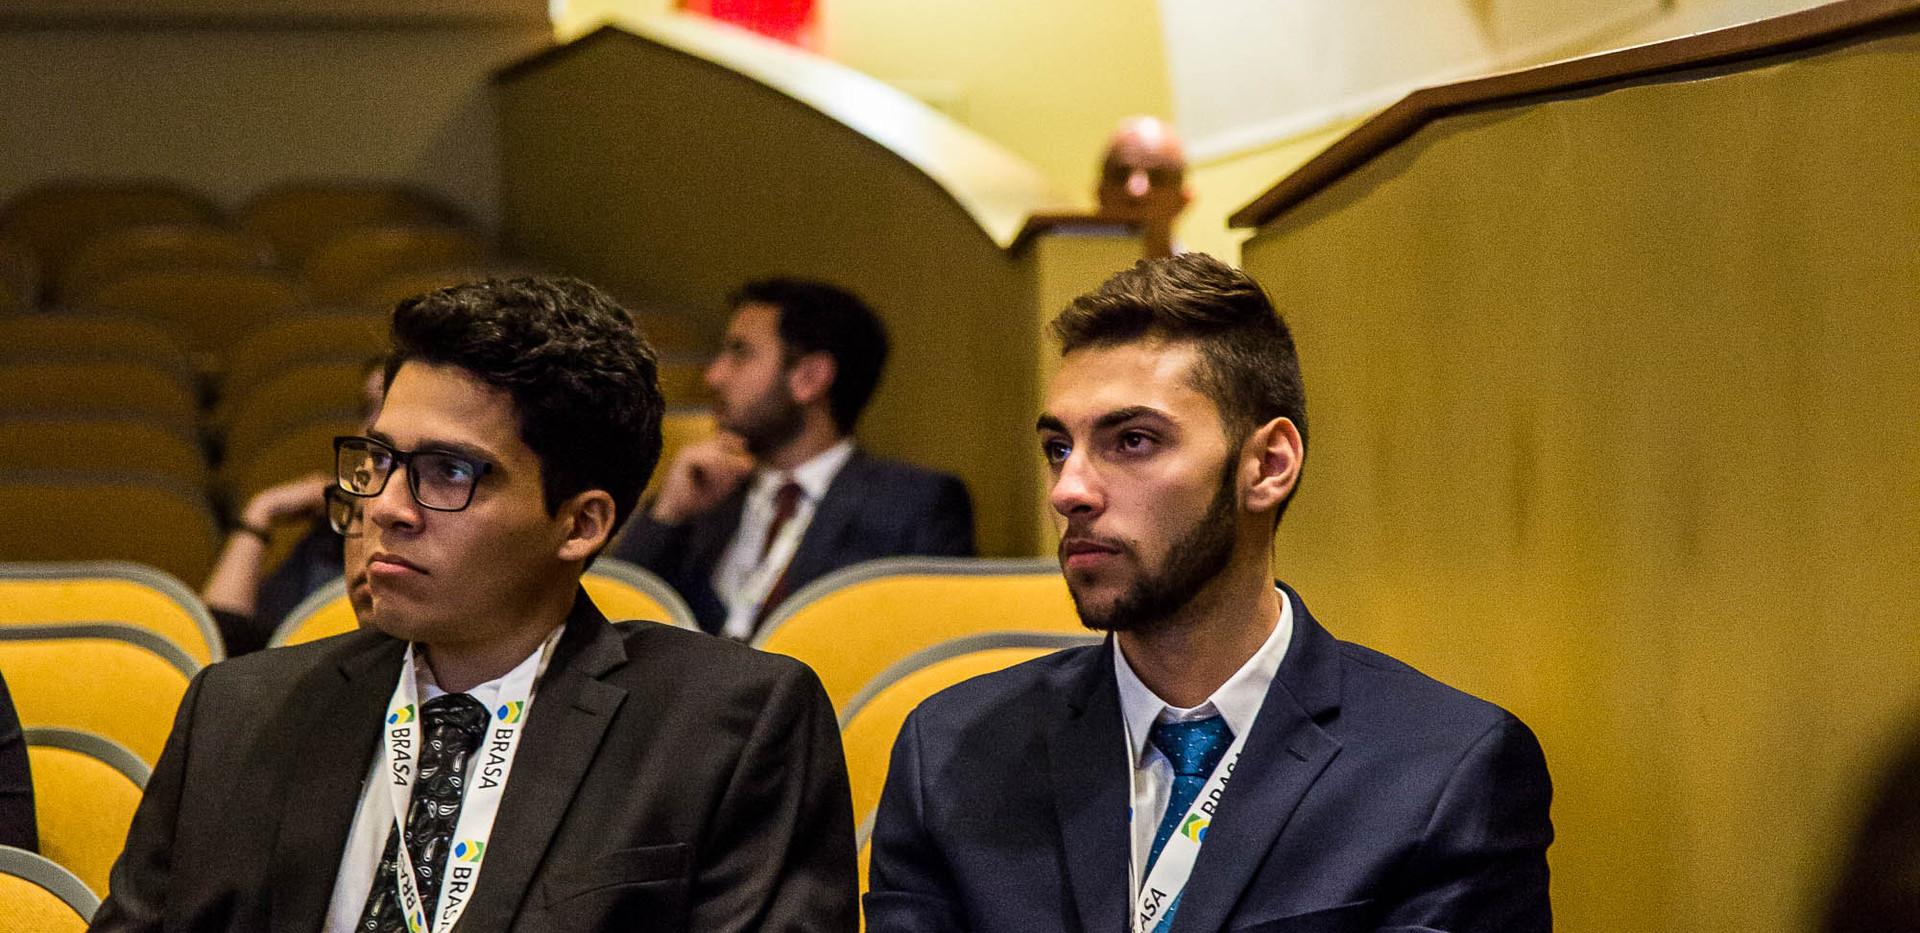 Brazil-FloridaStudentConference-55.jpg